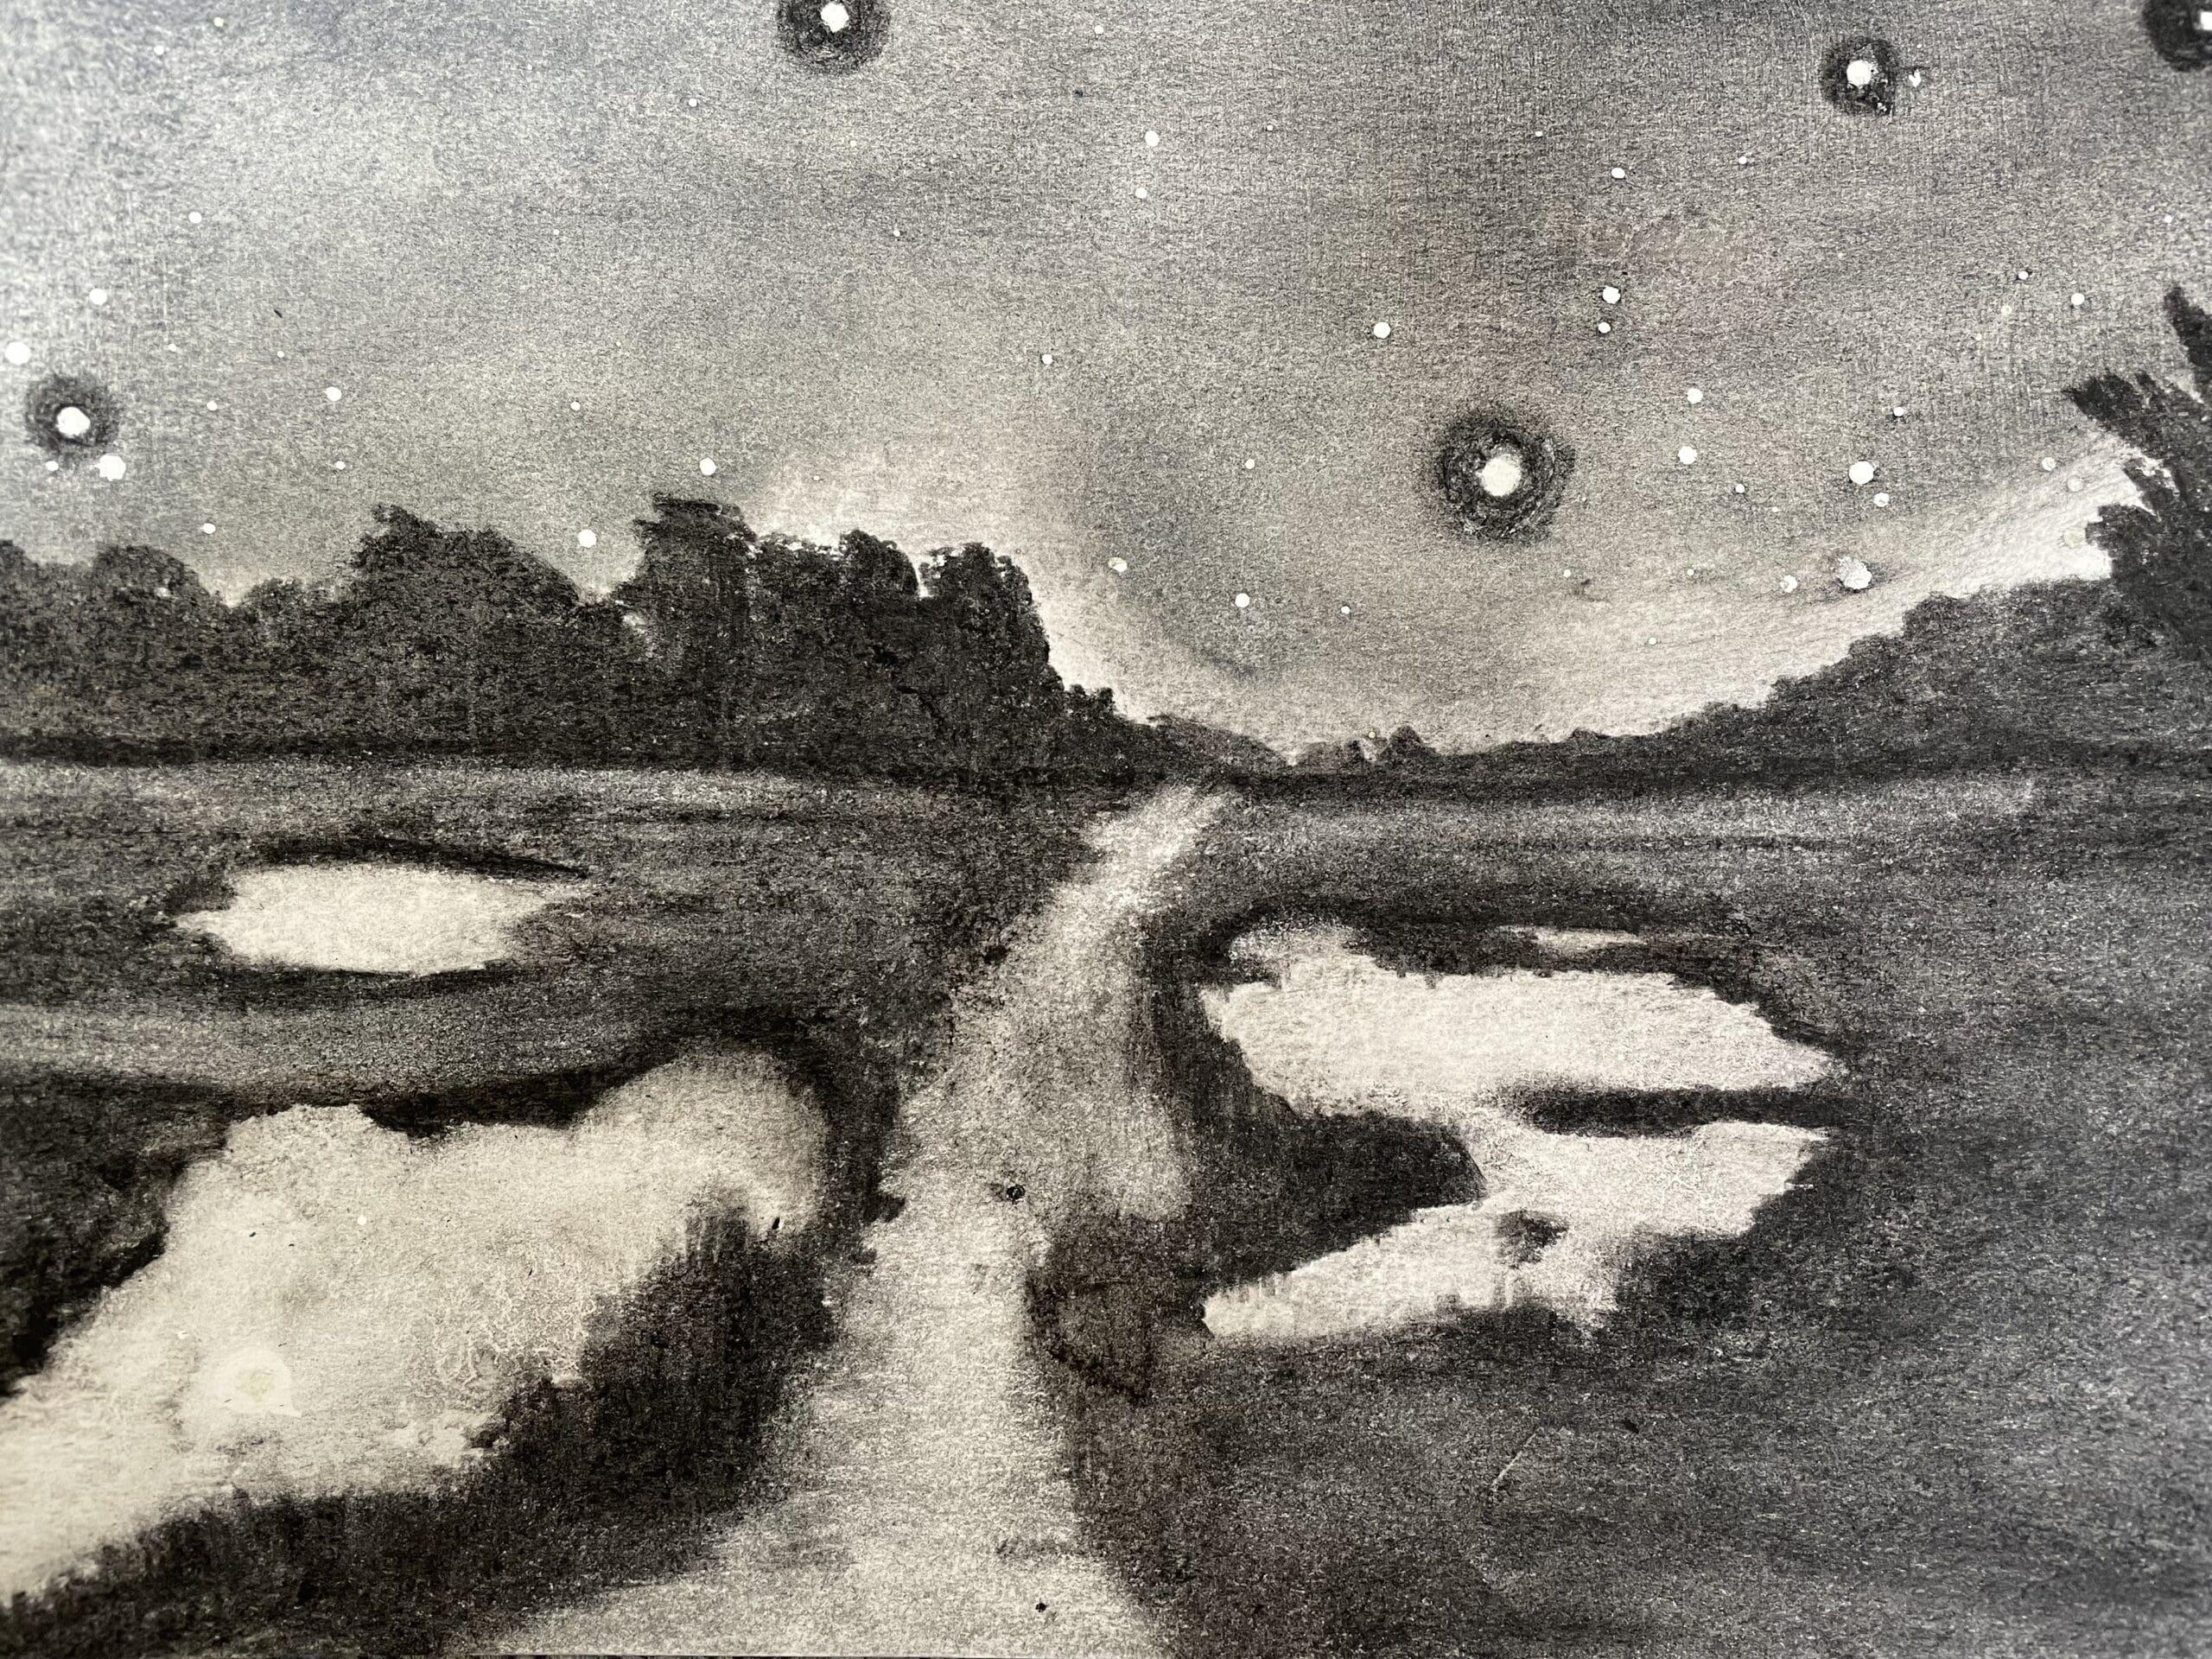 Saltmarsh Stiffkey II drawing